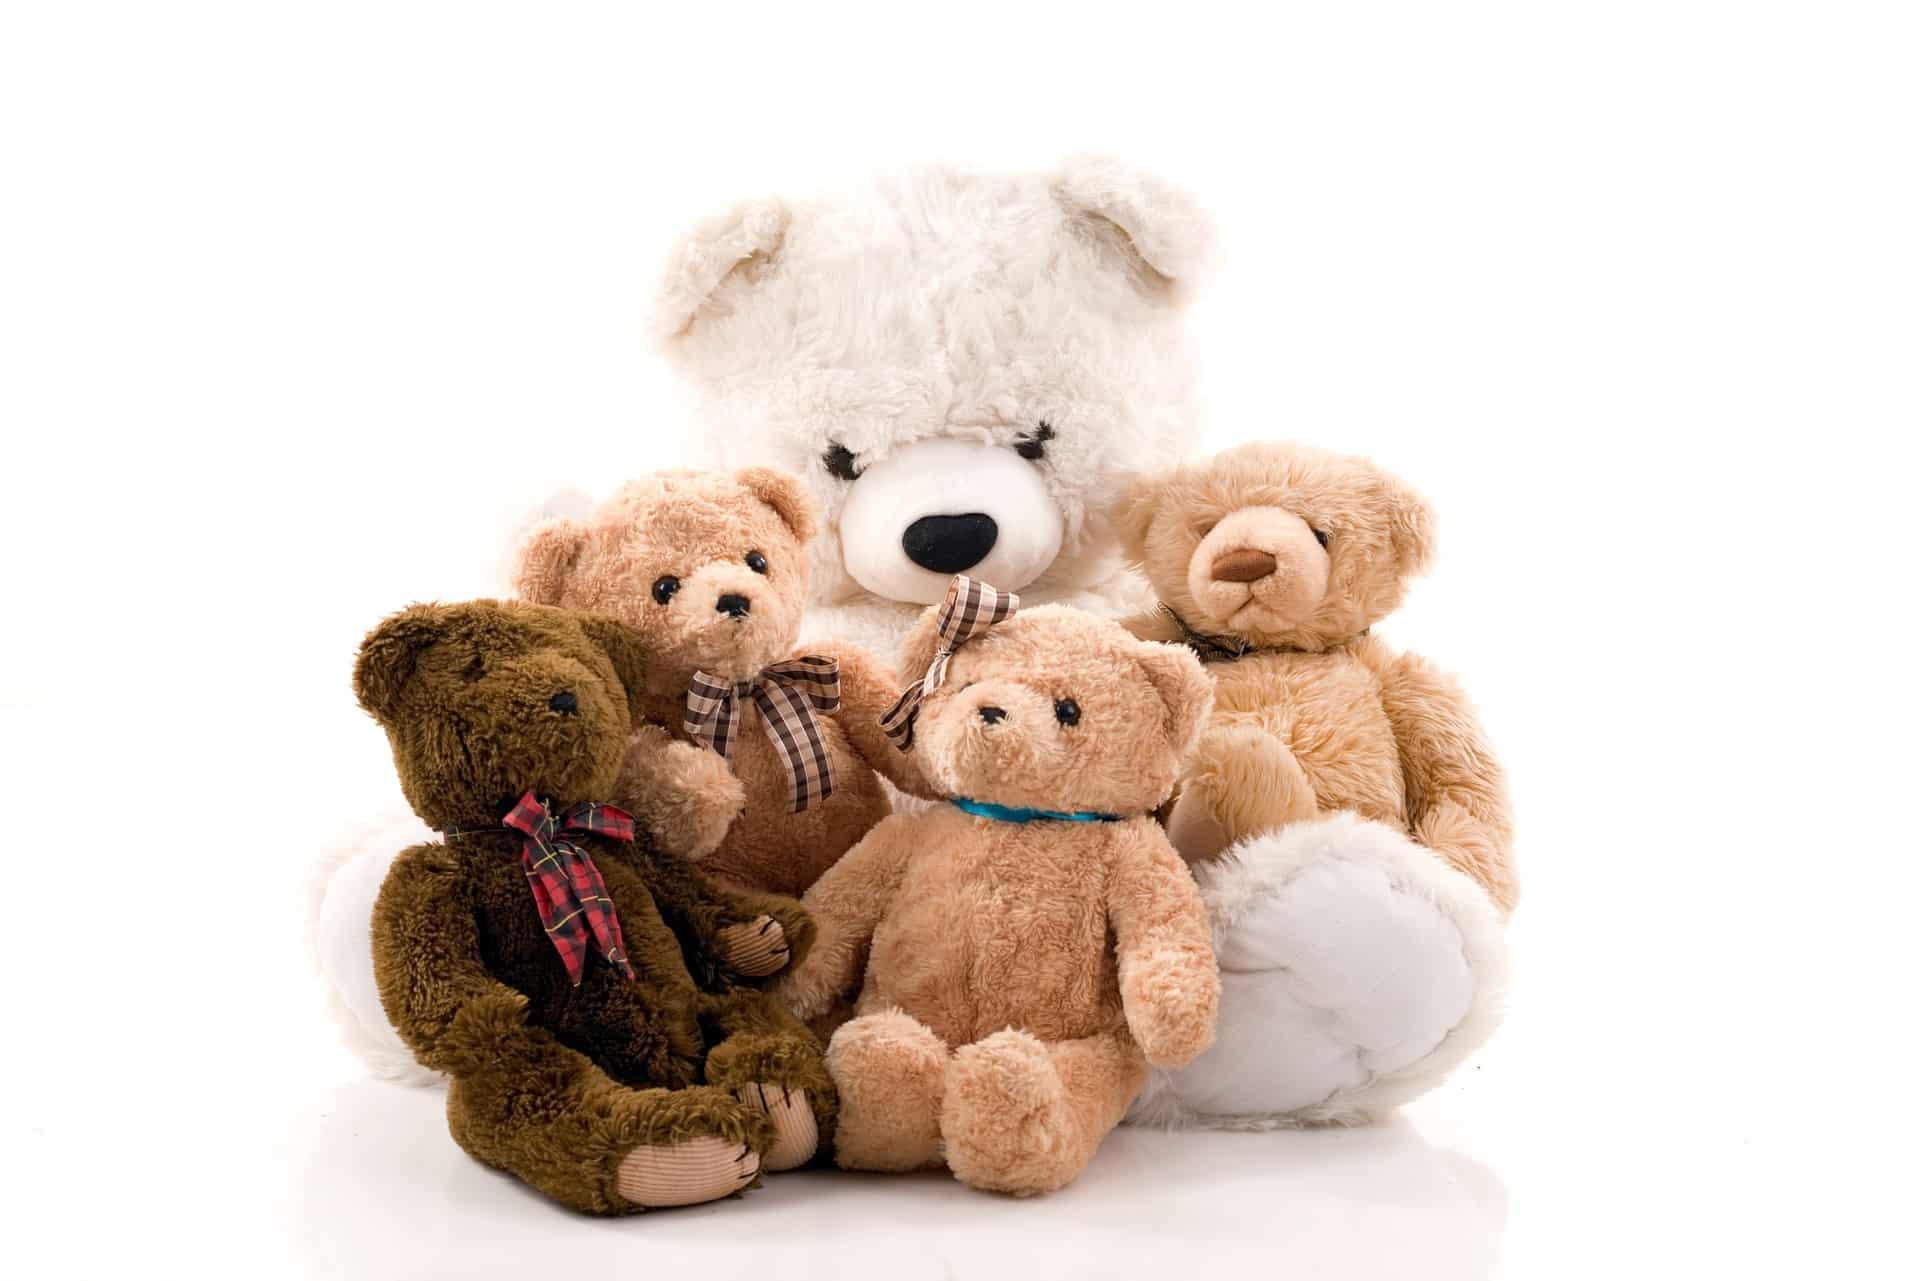 Teddy bears from childhood